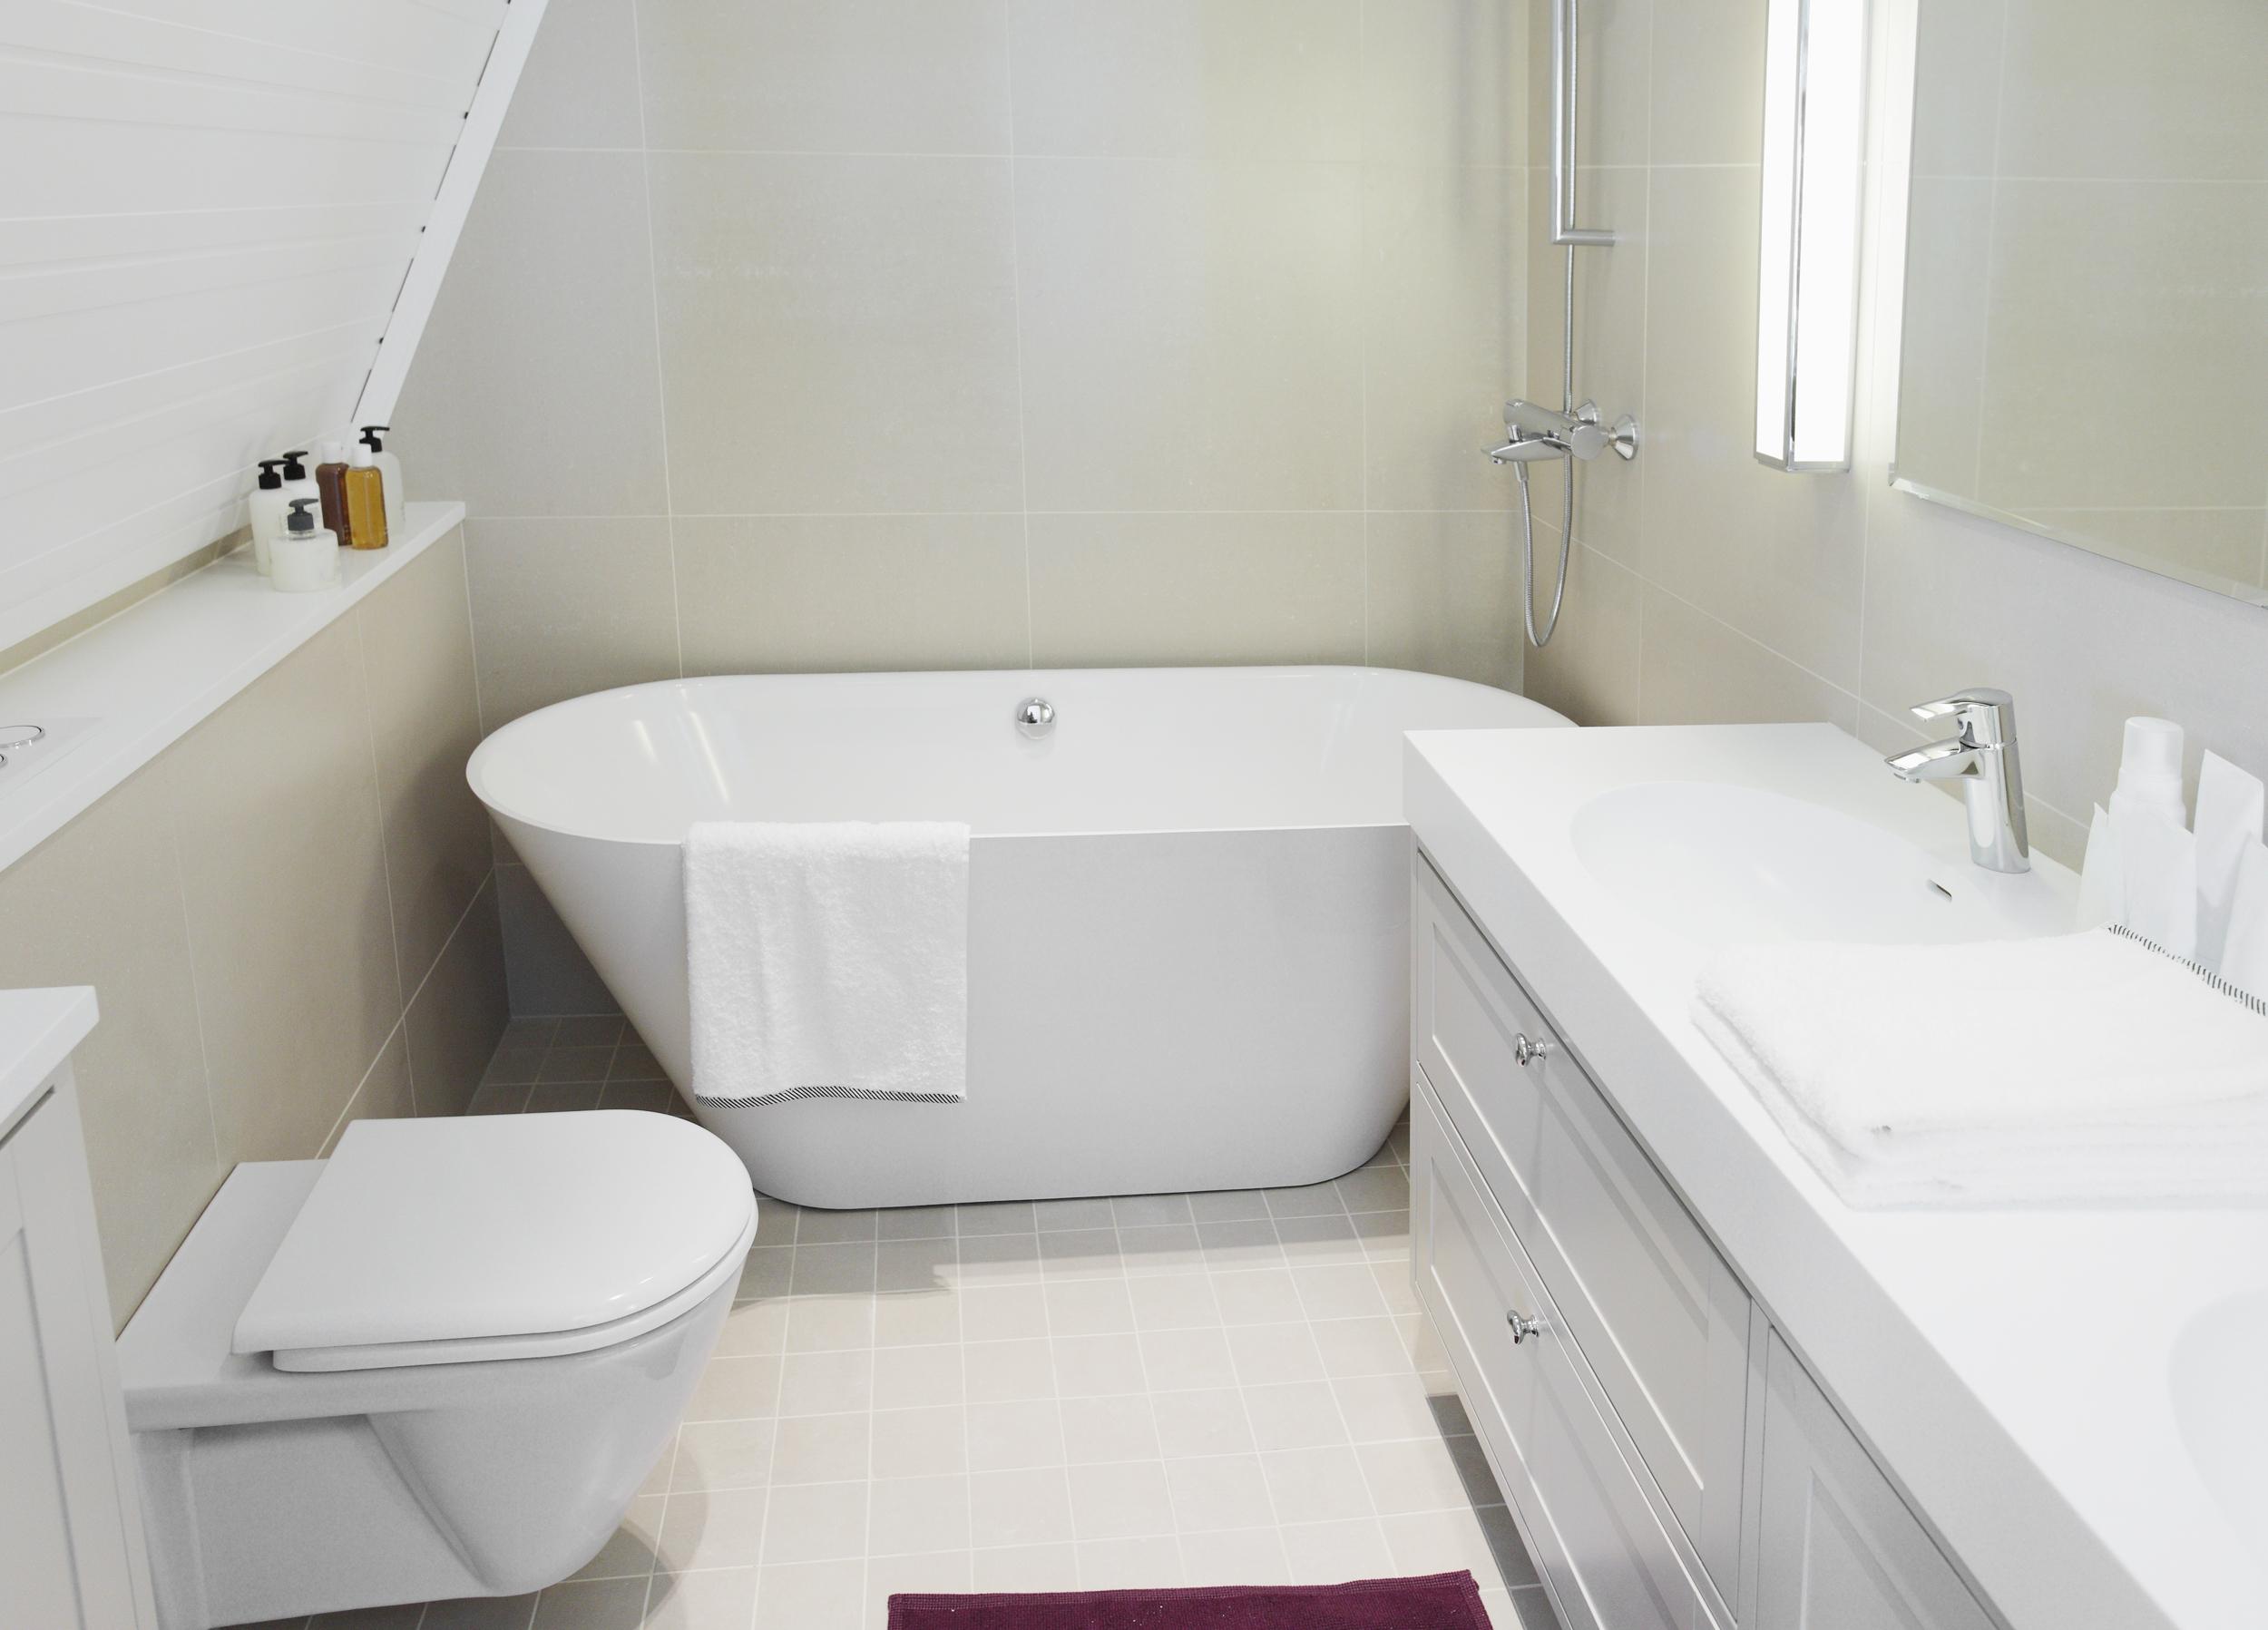 Small Bathroom Space Ideas | HomesFeed